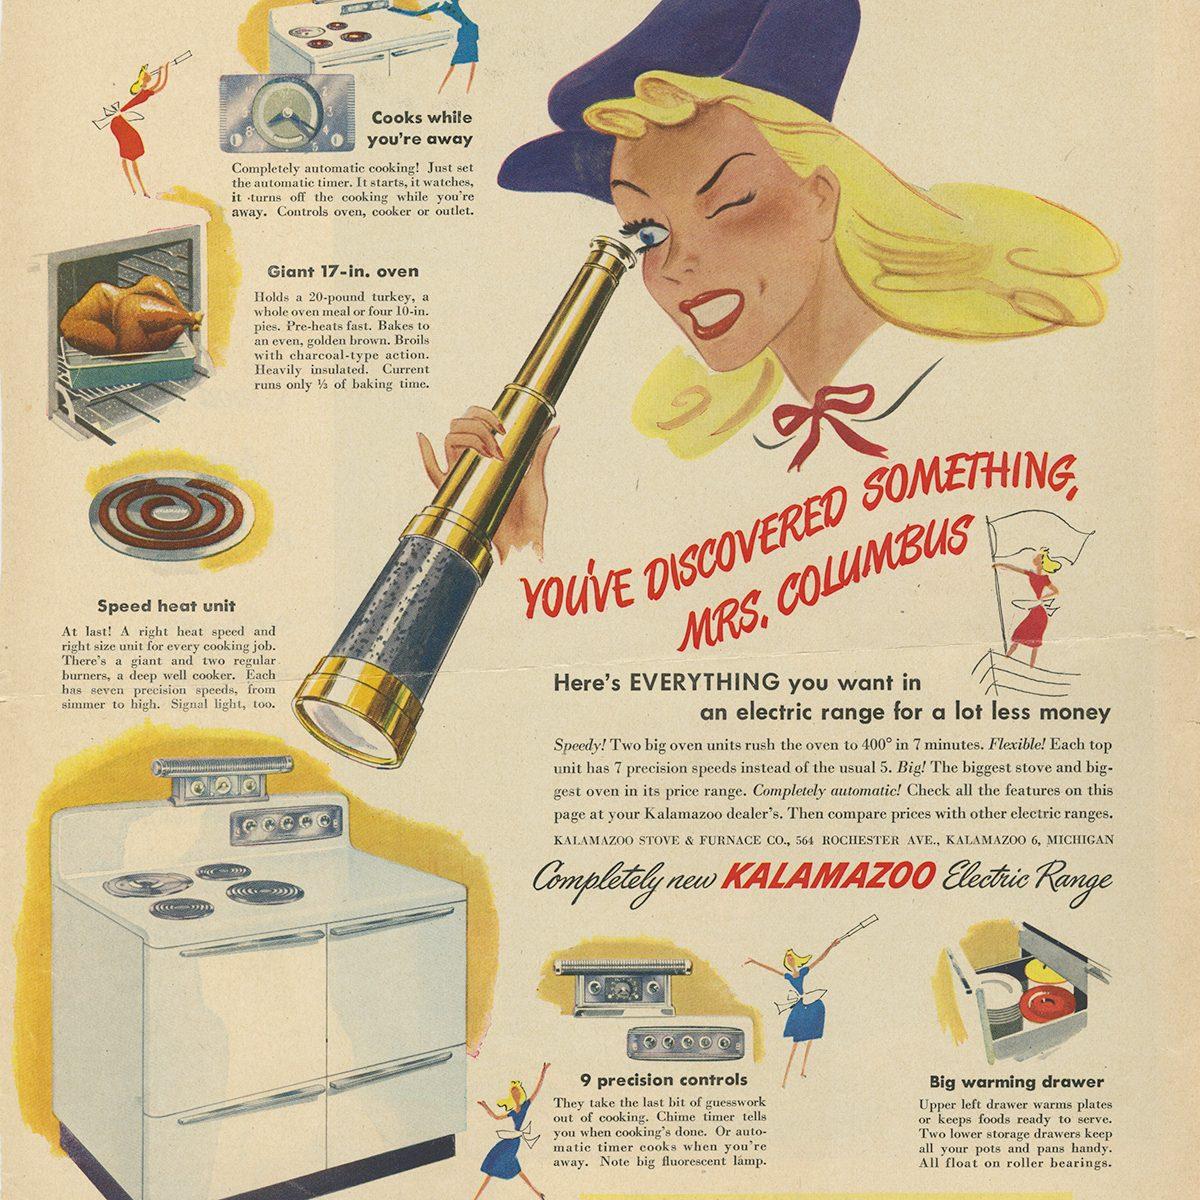 Kalamazoo Electric Range ad